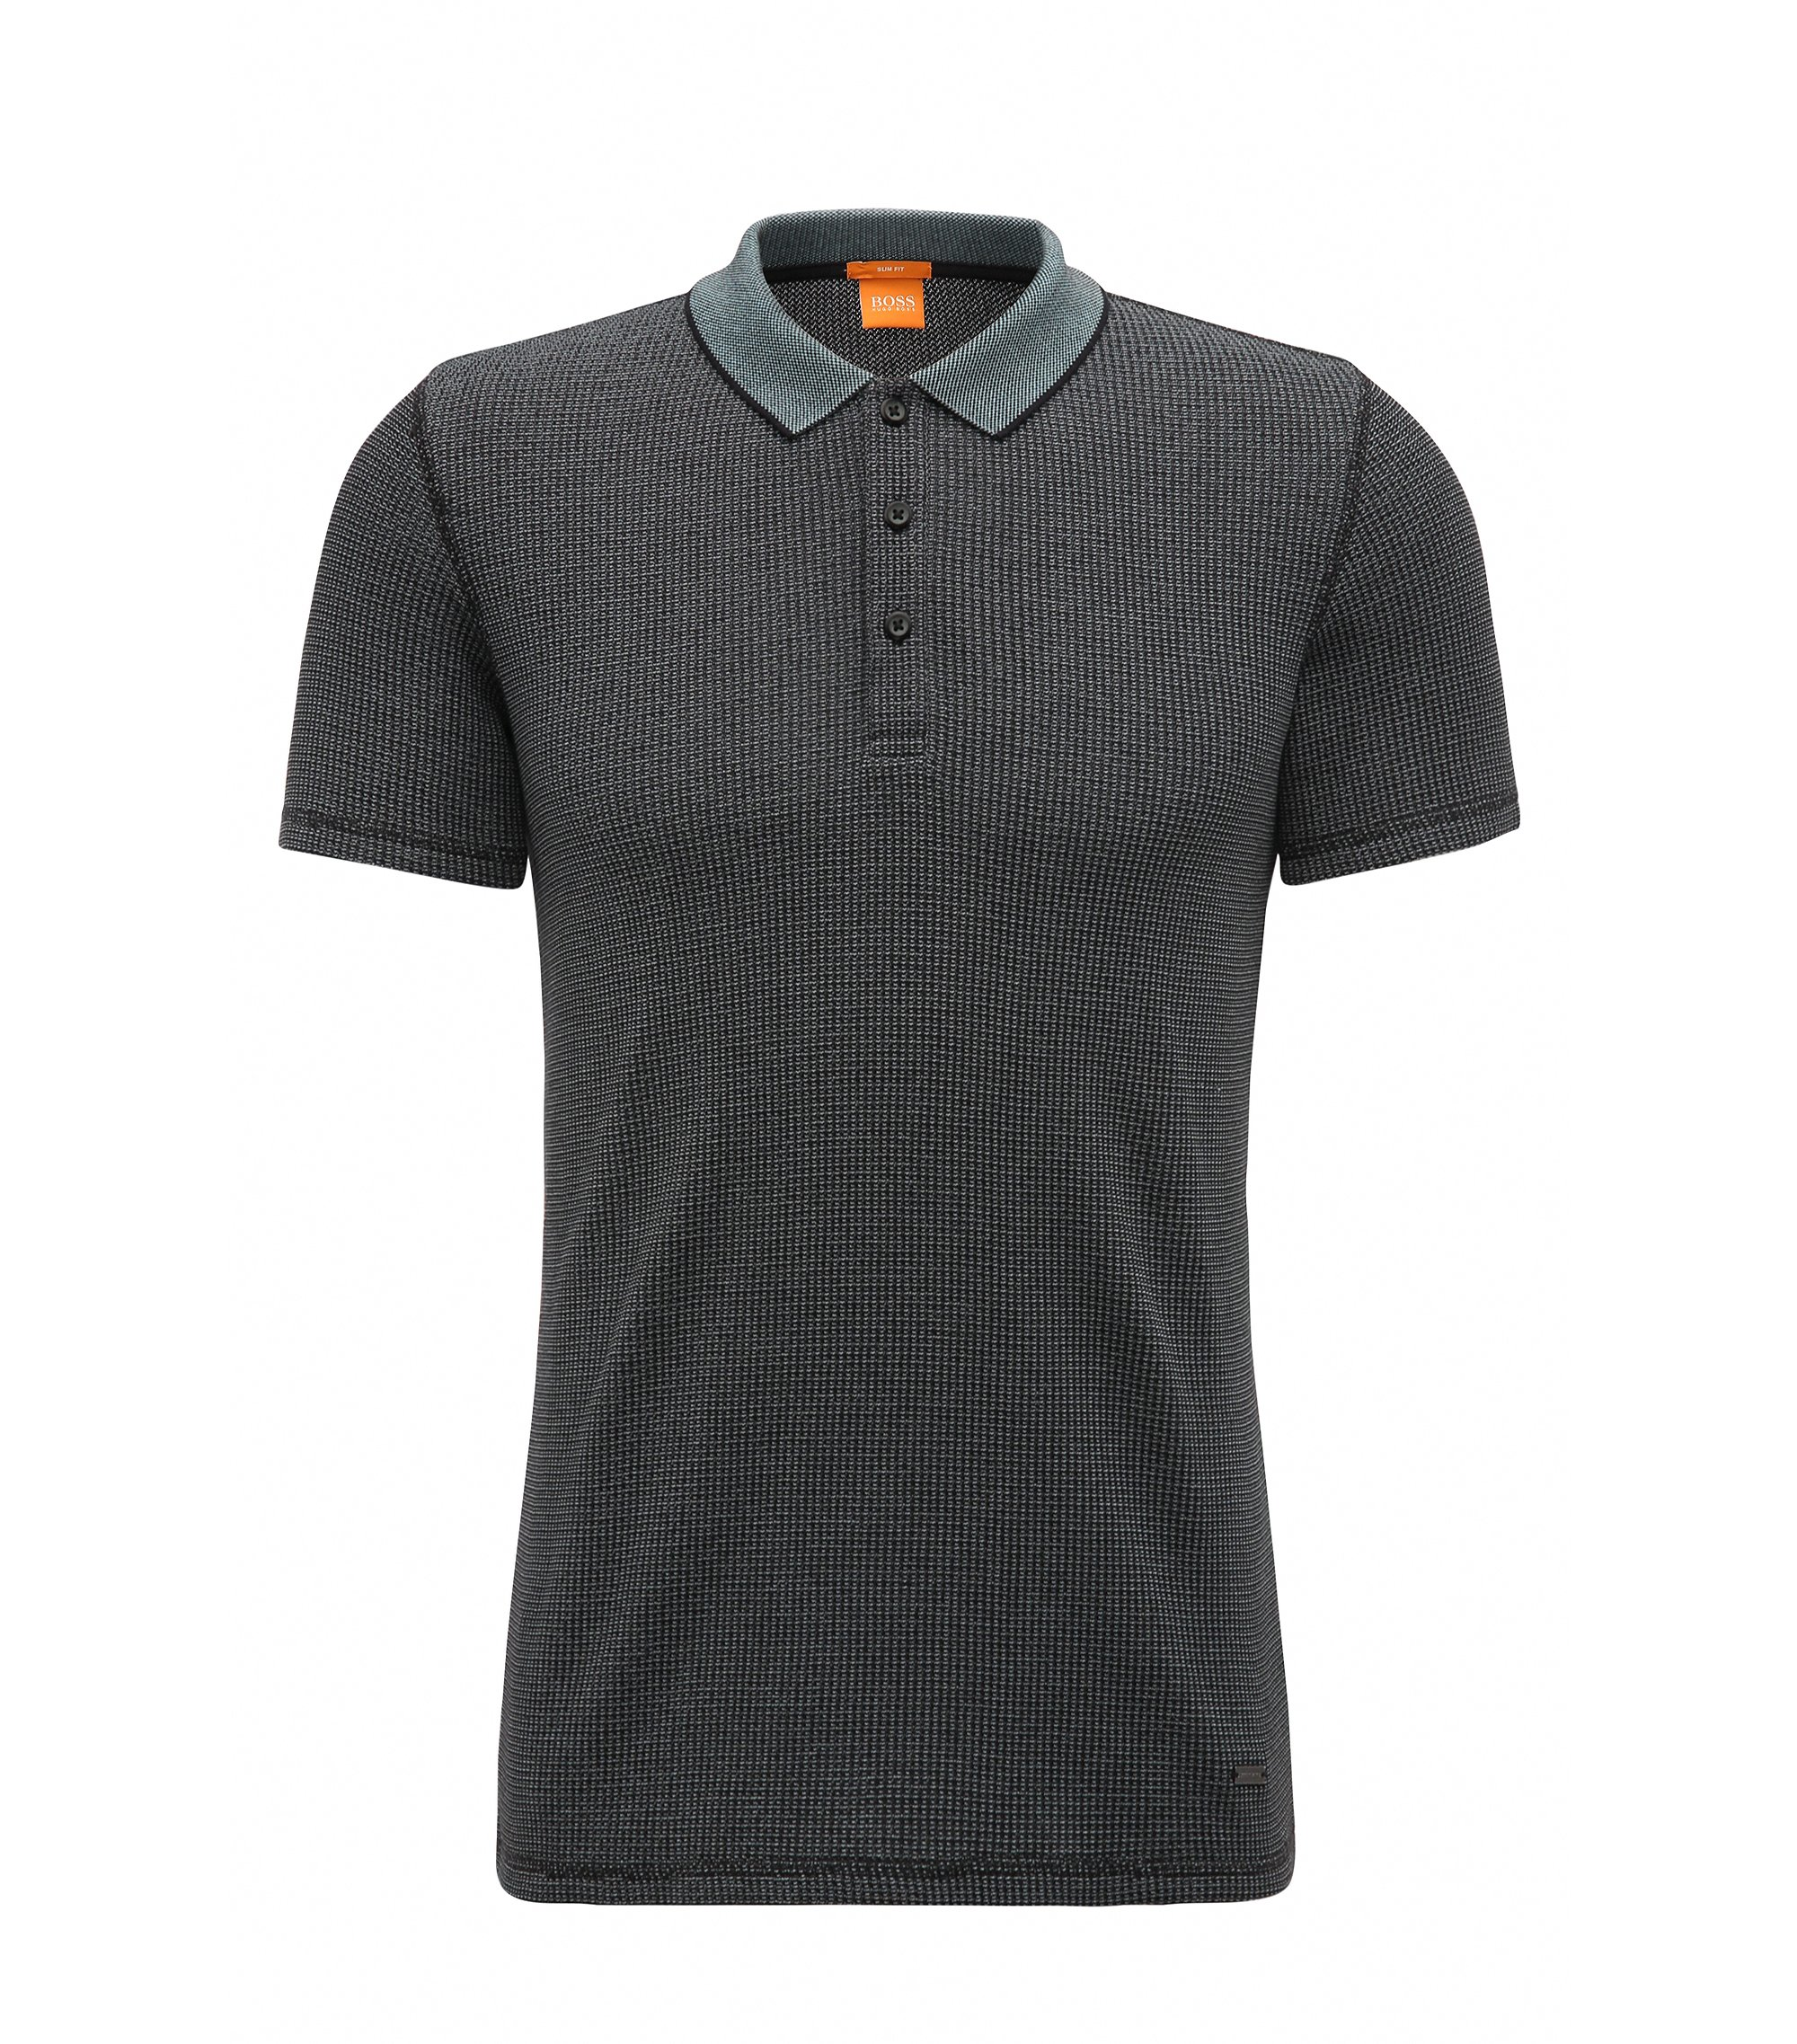 Knit Cotton Blend Polo Shirt, Slim Fit | Poser, Black